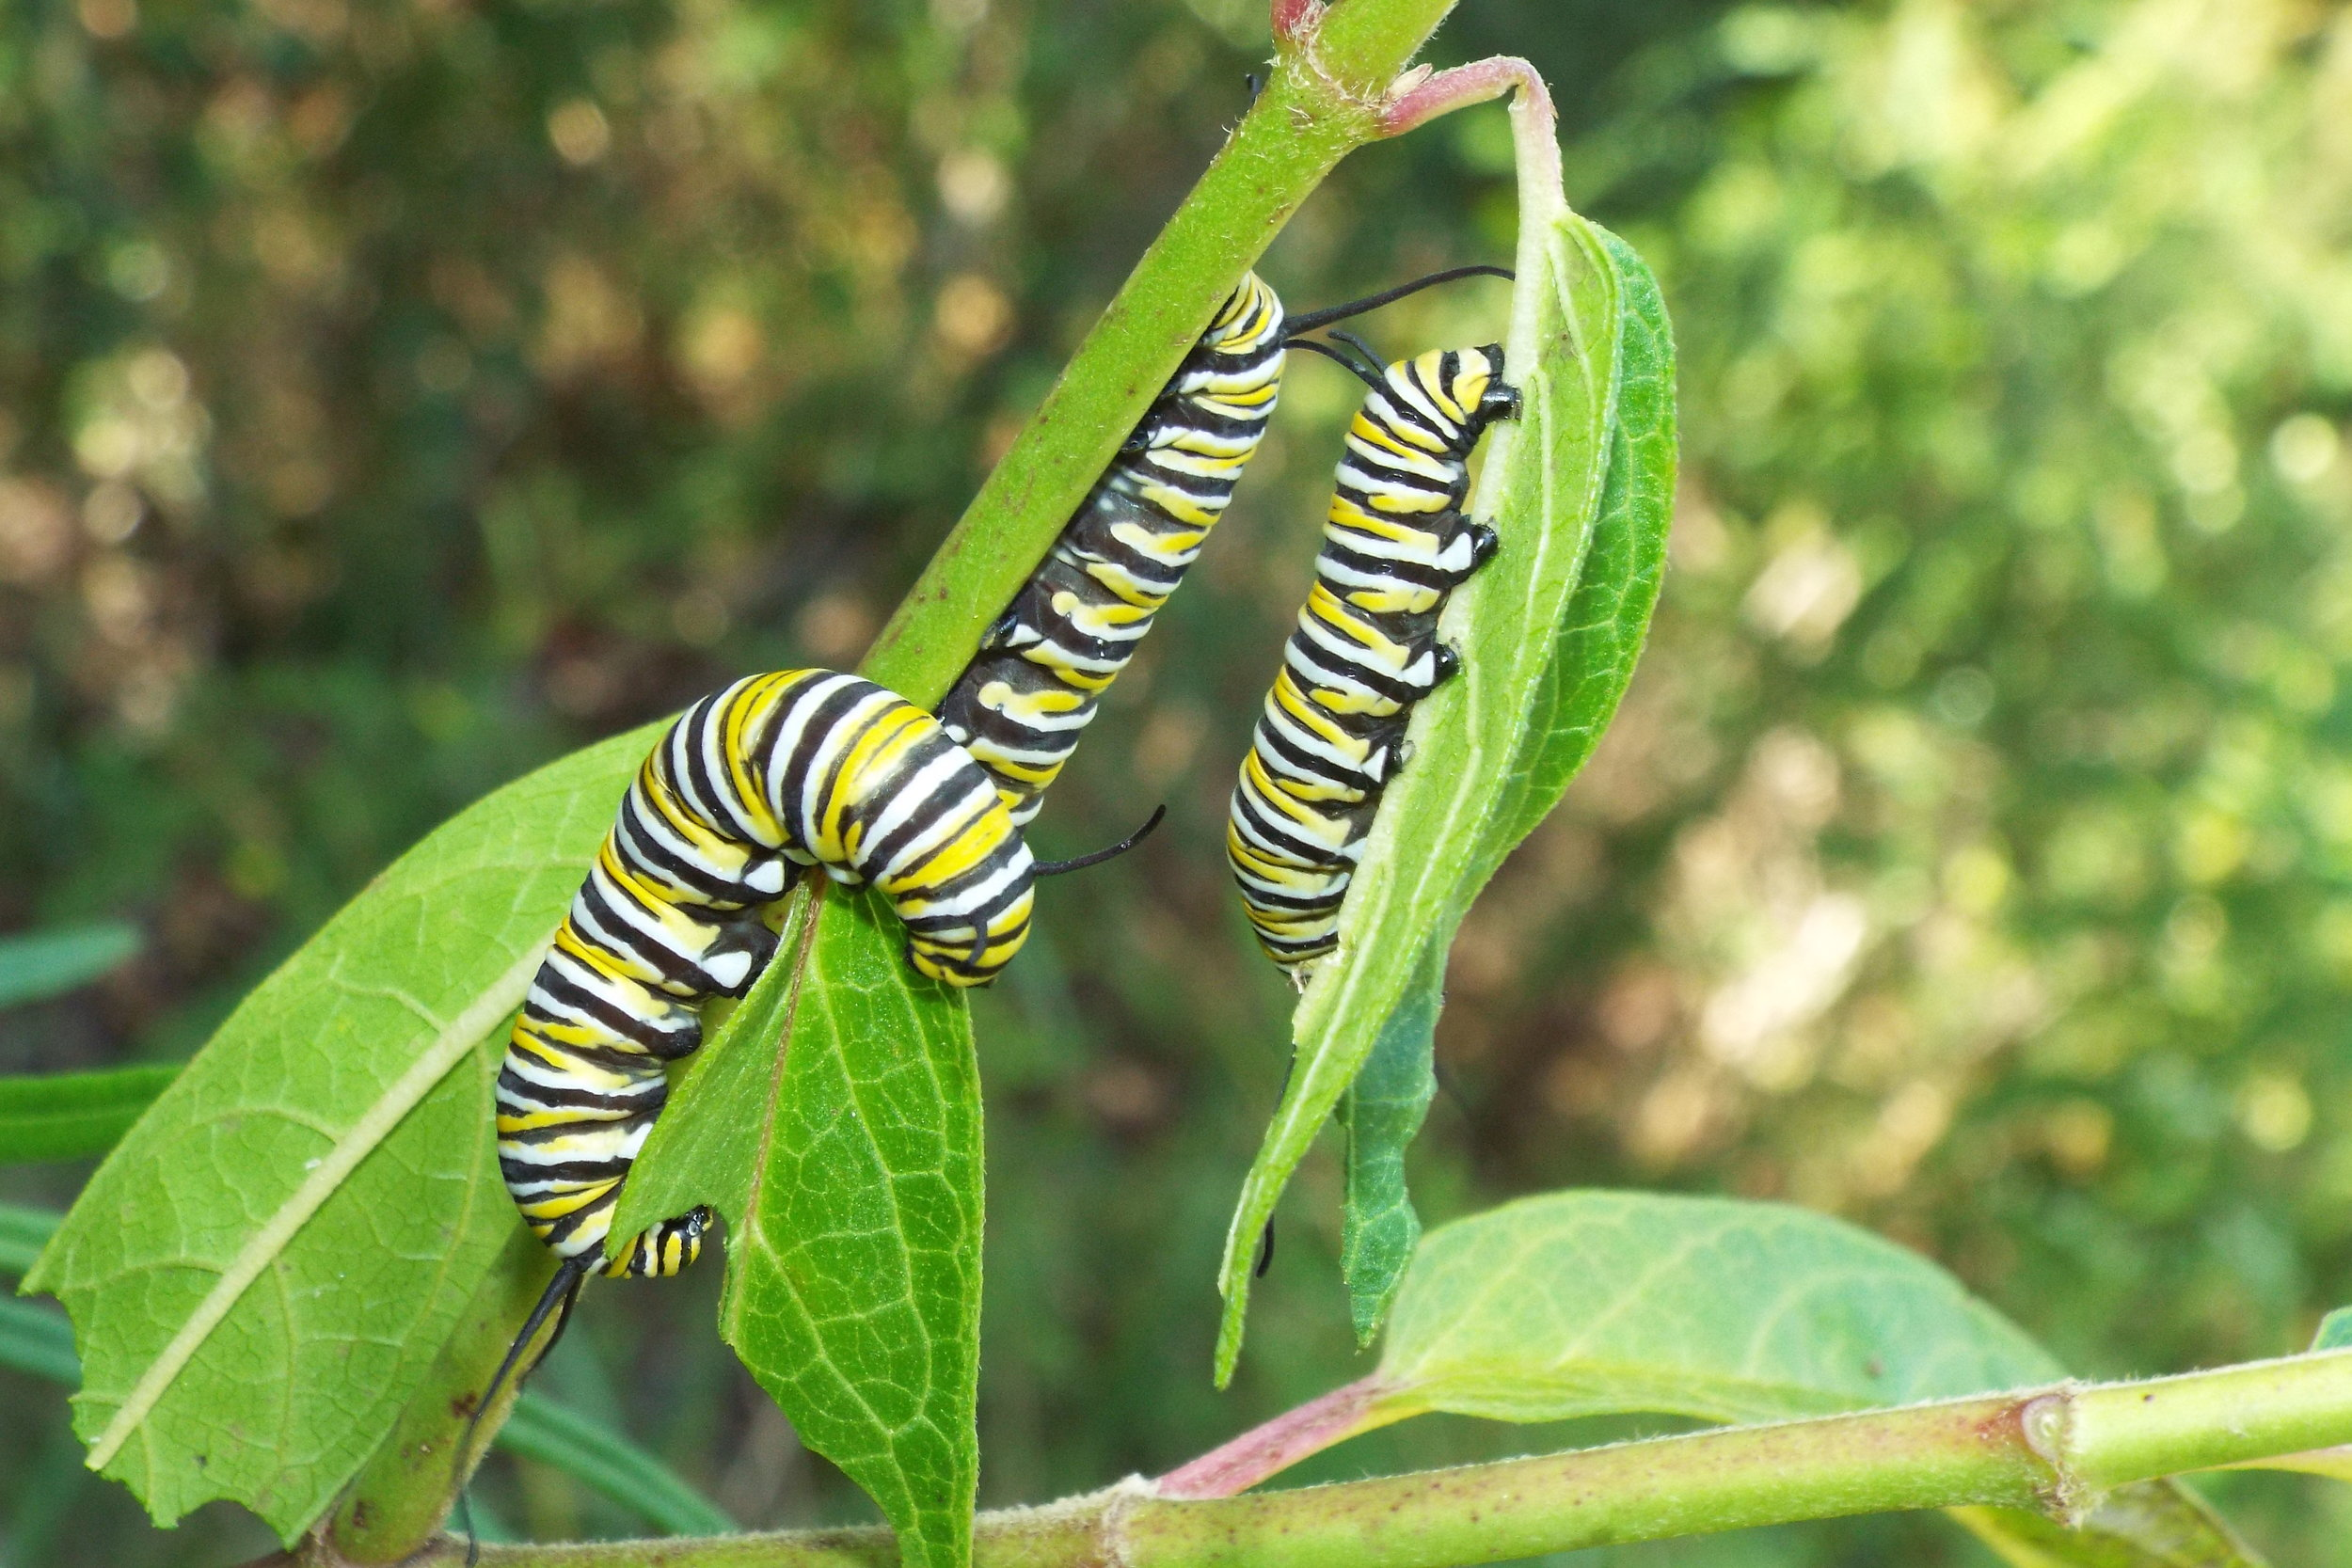 Monarch Caterpillars. Image courtesy of Scott Davis